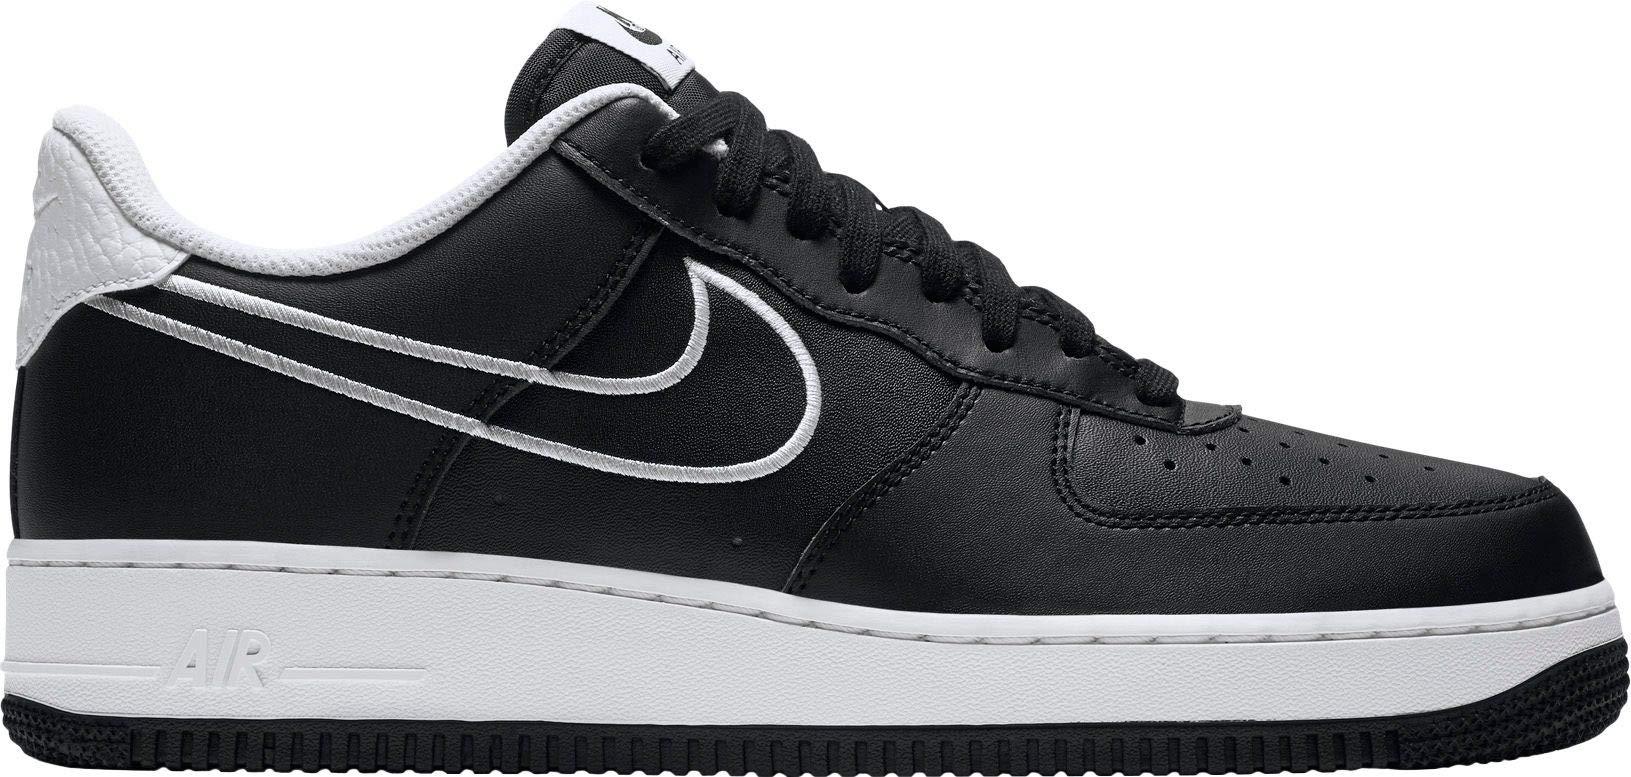 NIKE Men's Air Force 1 '07 Leather Shoe Black/White, 8.5